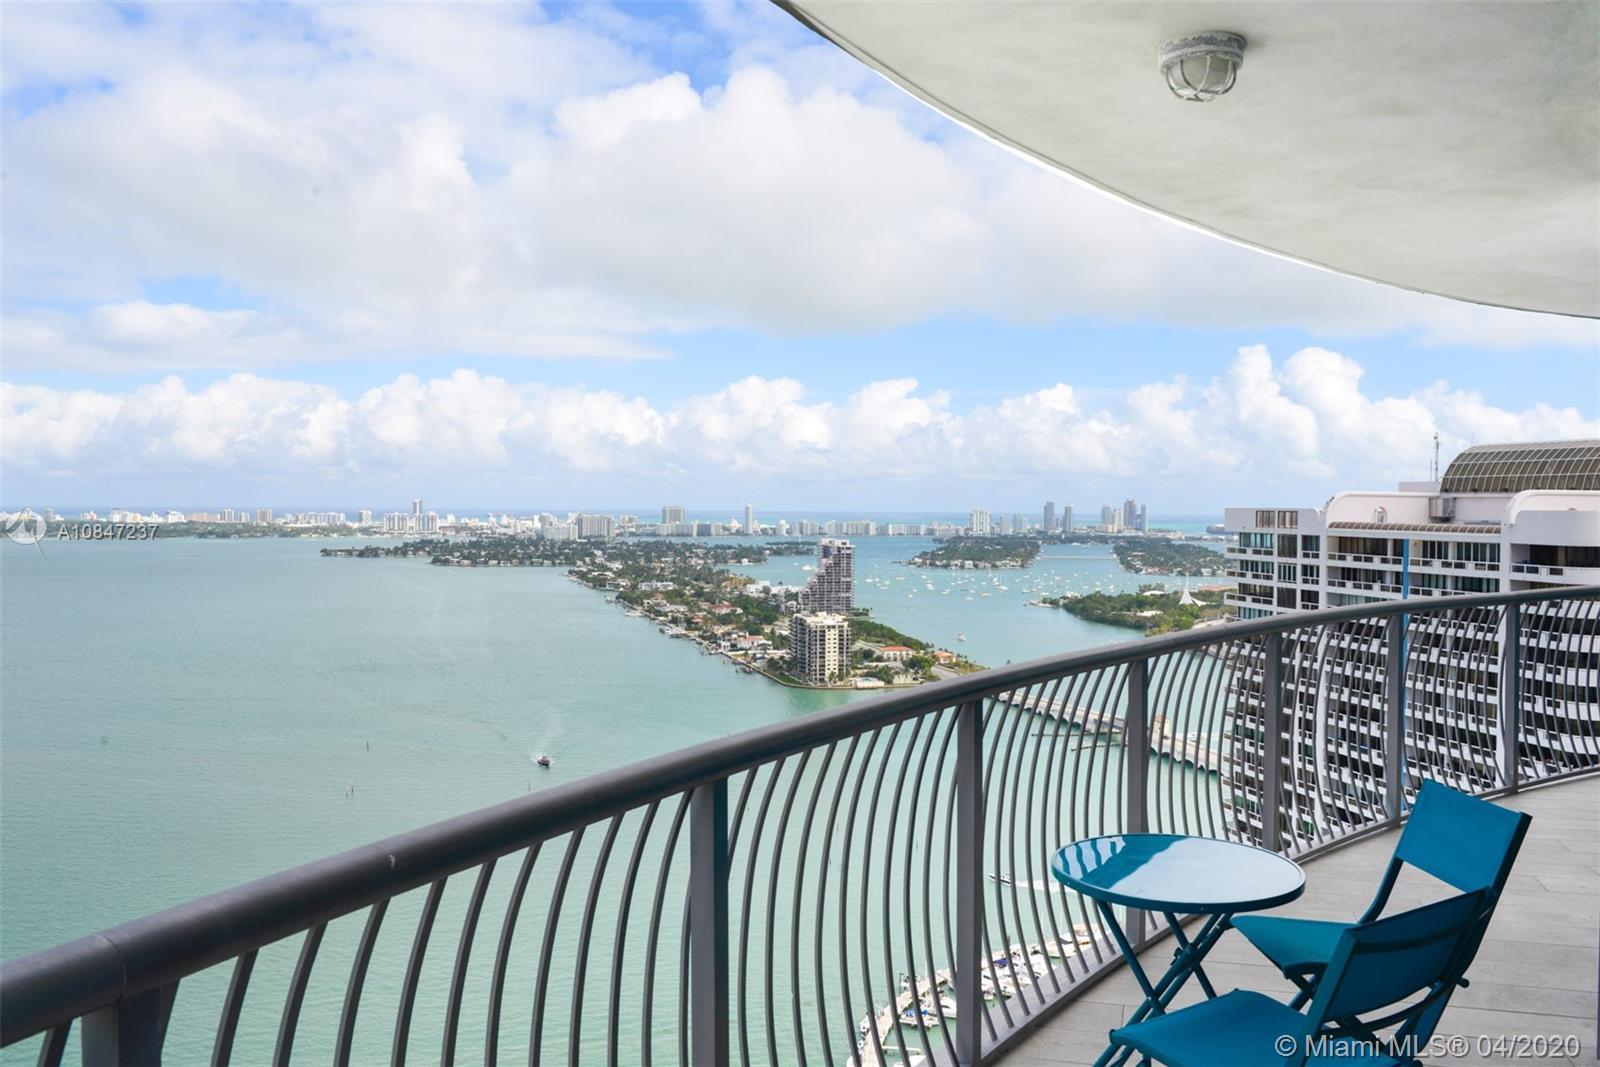 1750 N Bayshore Dr # 4001, Miami, Florida 33132, 2 Bedrooms Bedrooms, ,2 BathroomsBathrooms,Residential,For Sale,1750 N Bayshore Dr # 4001,A10847237